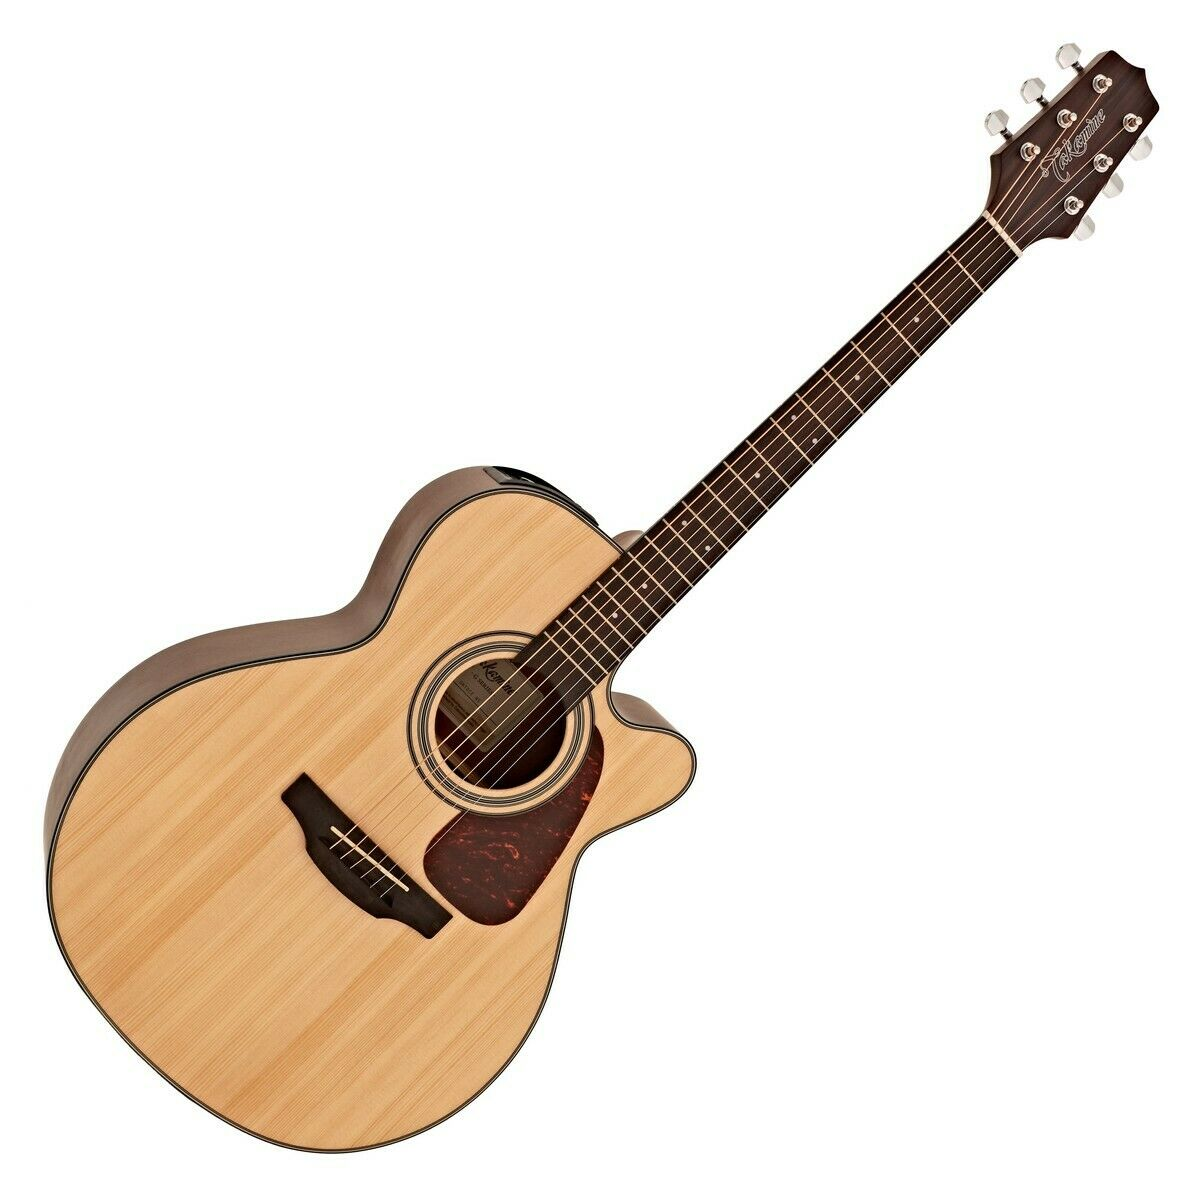 GN10CE-NS Electro Acoustic Guitar Natural Satin: Acoustic Guitar